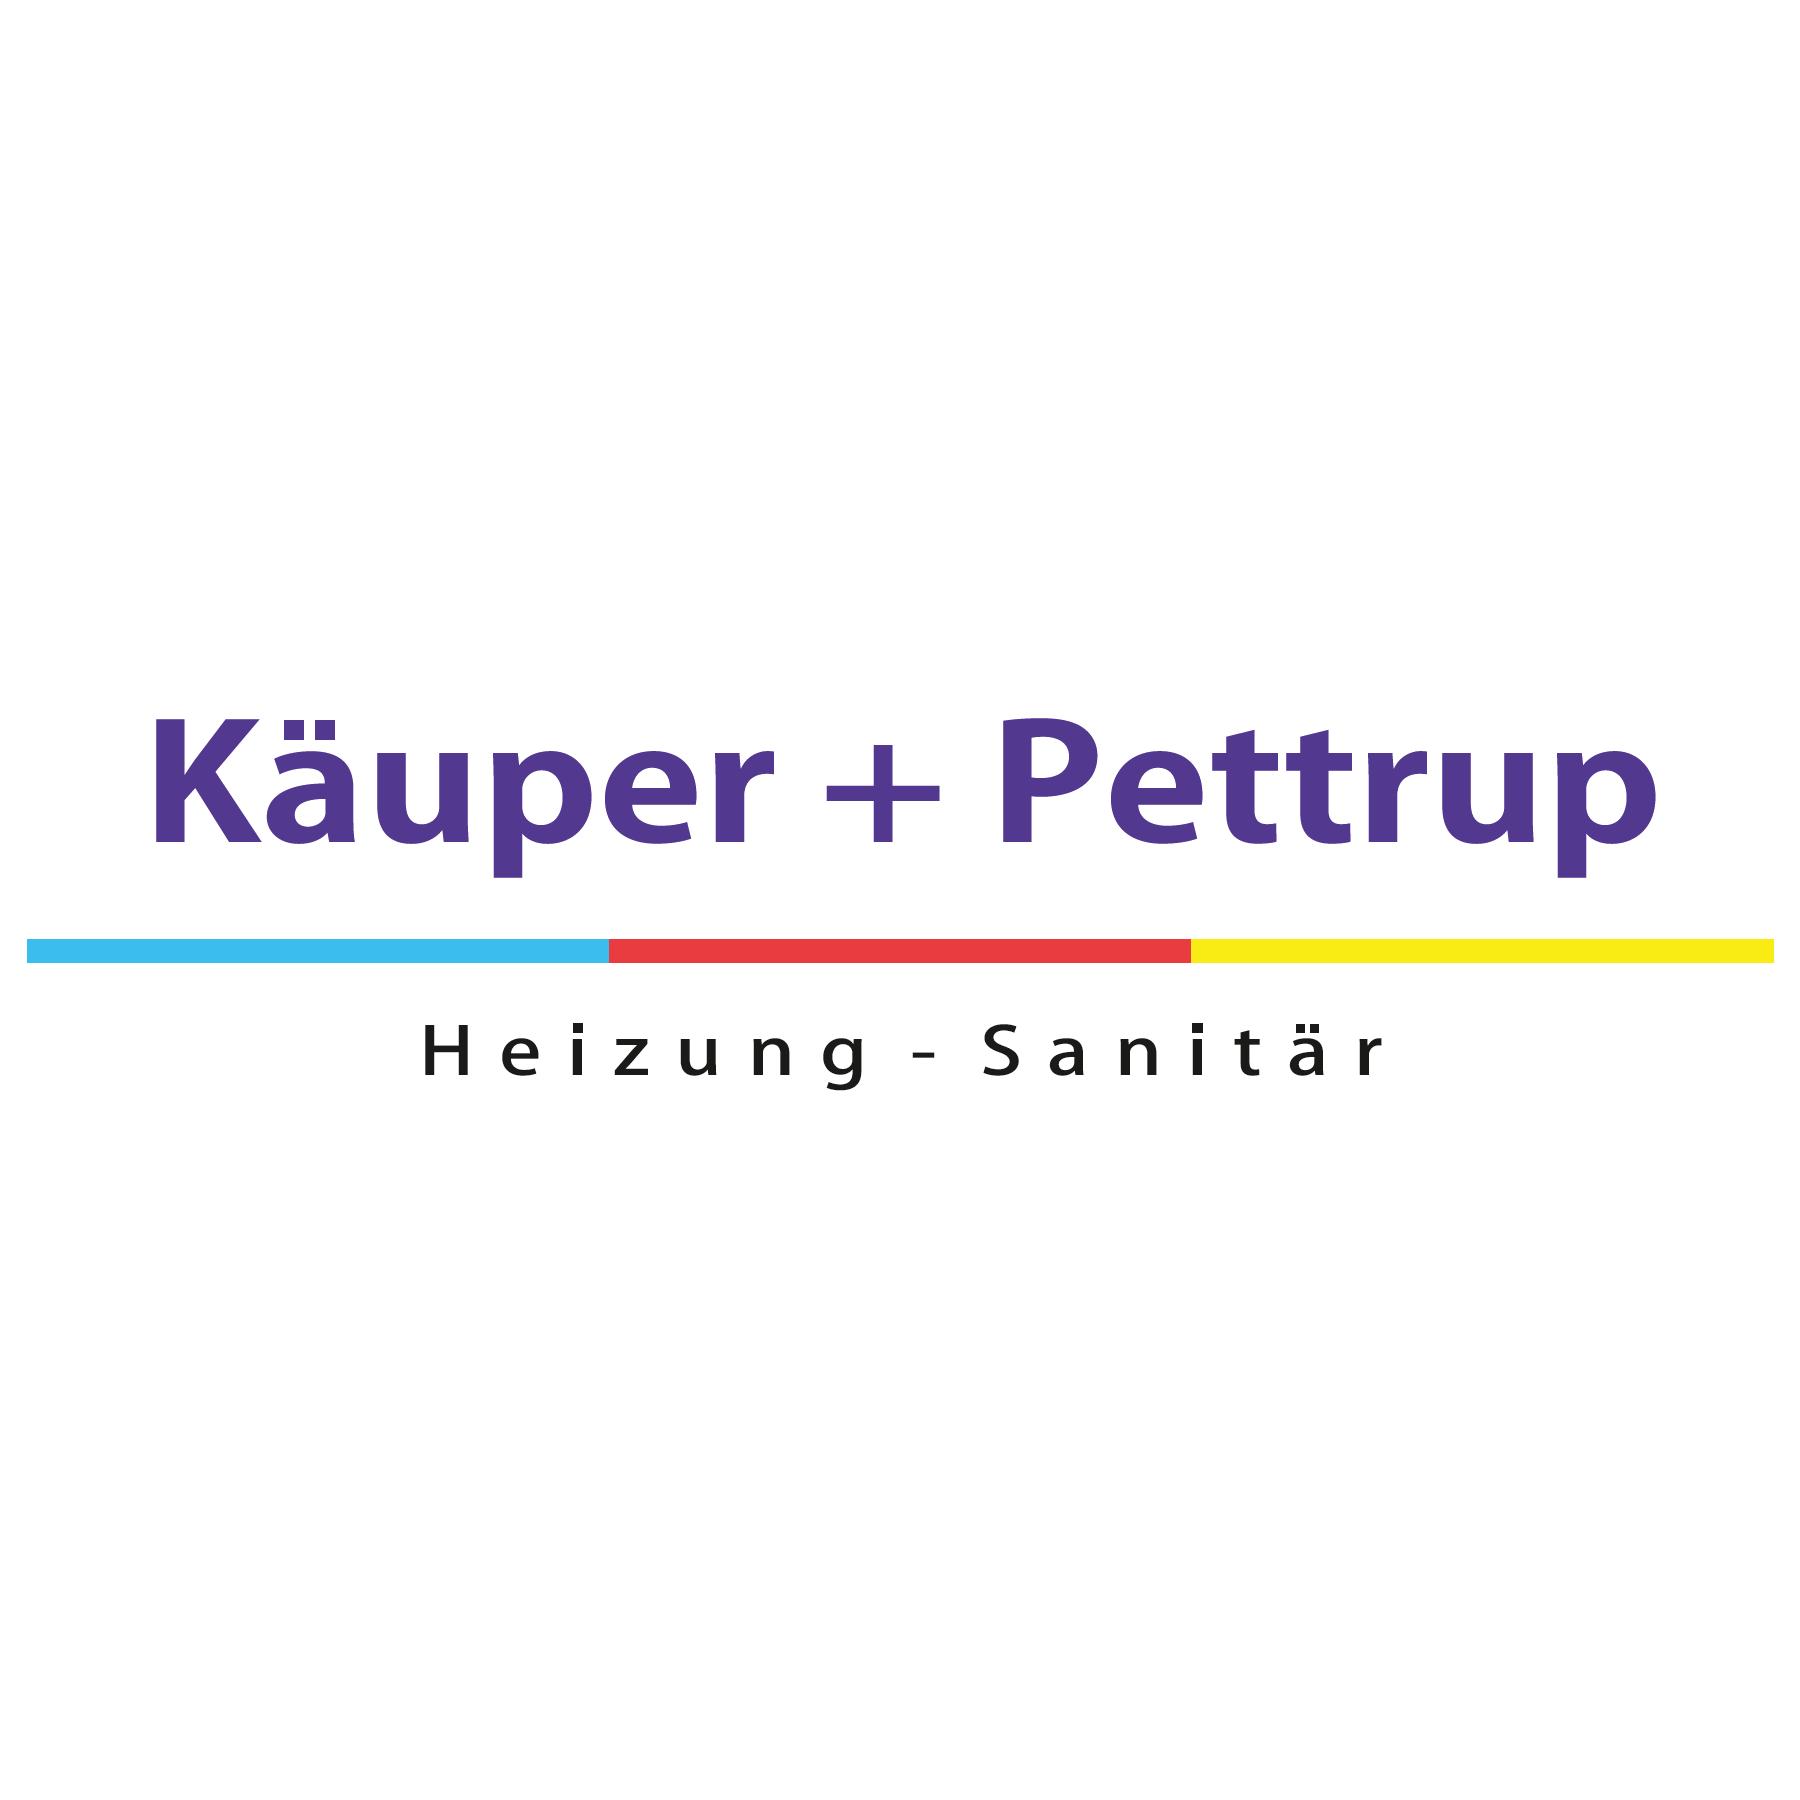 Käuper & Pettrup GmbH & Co KG | Sanitär Heizung